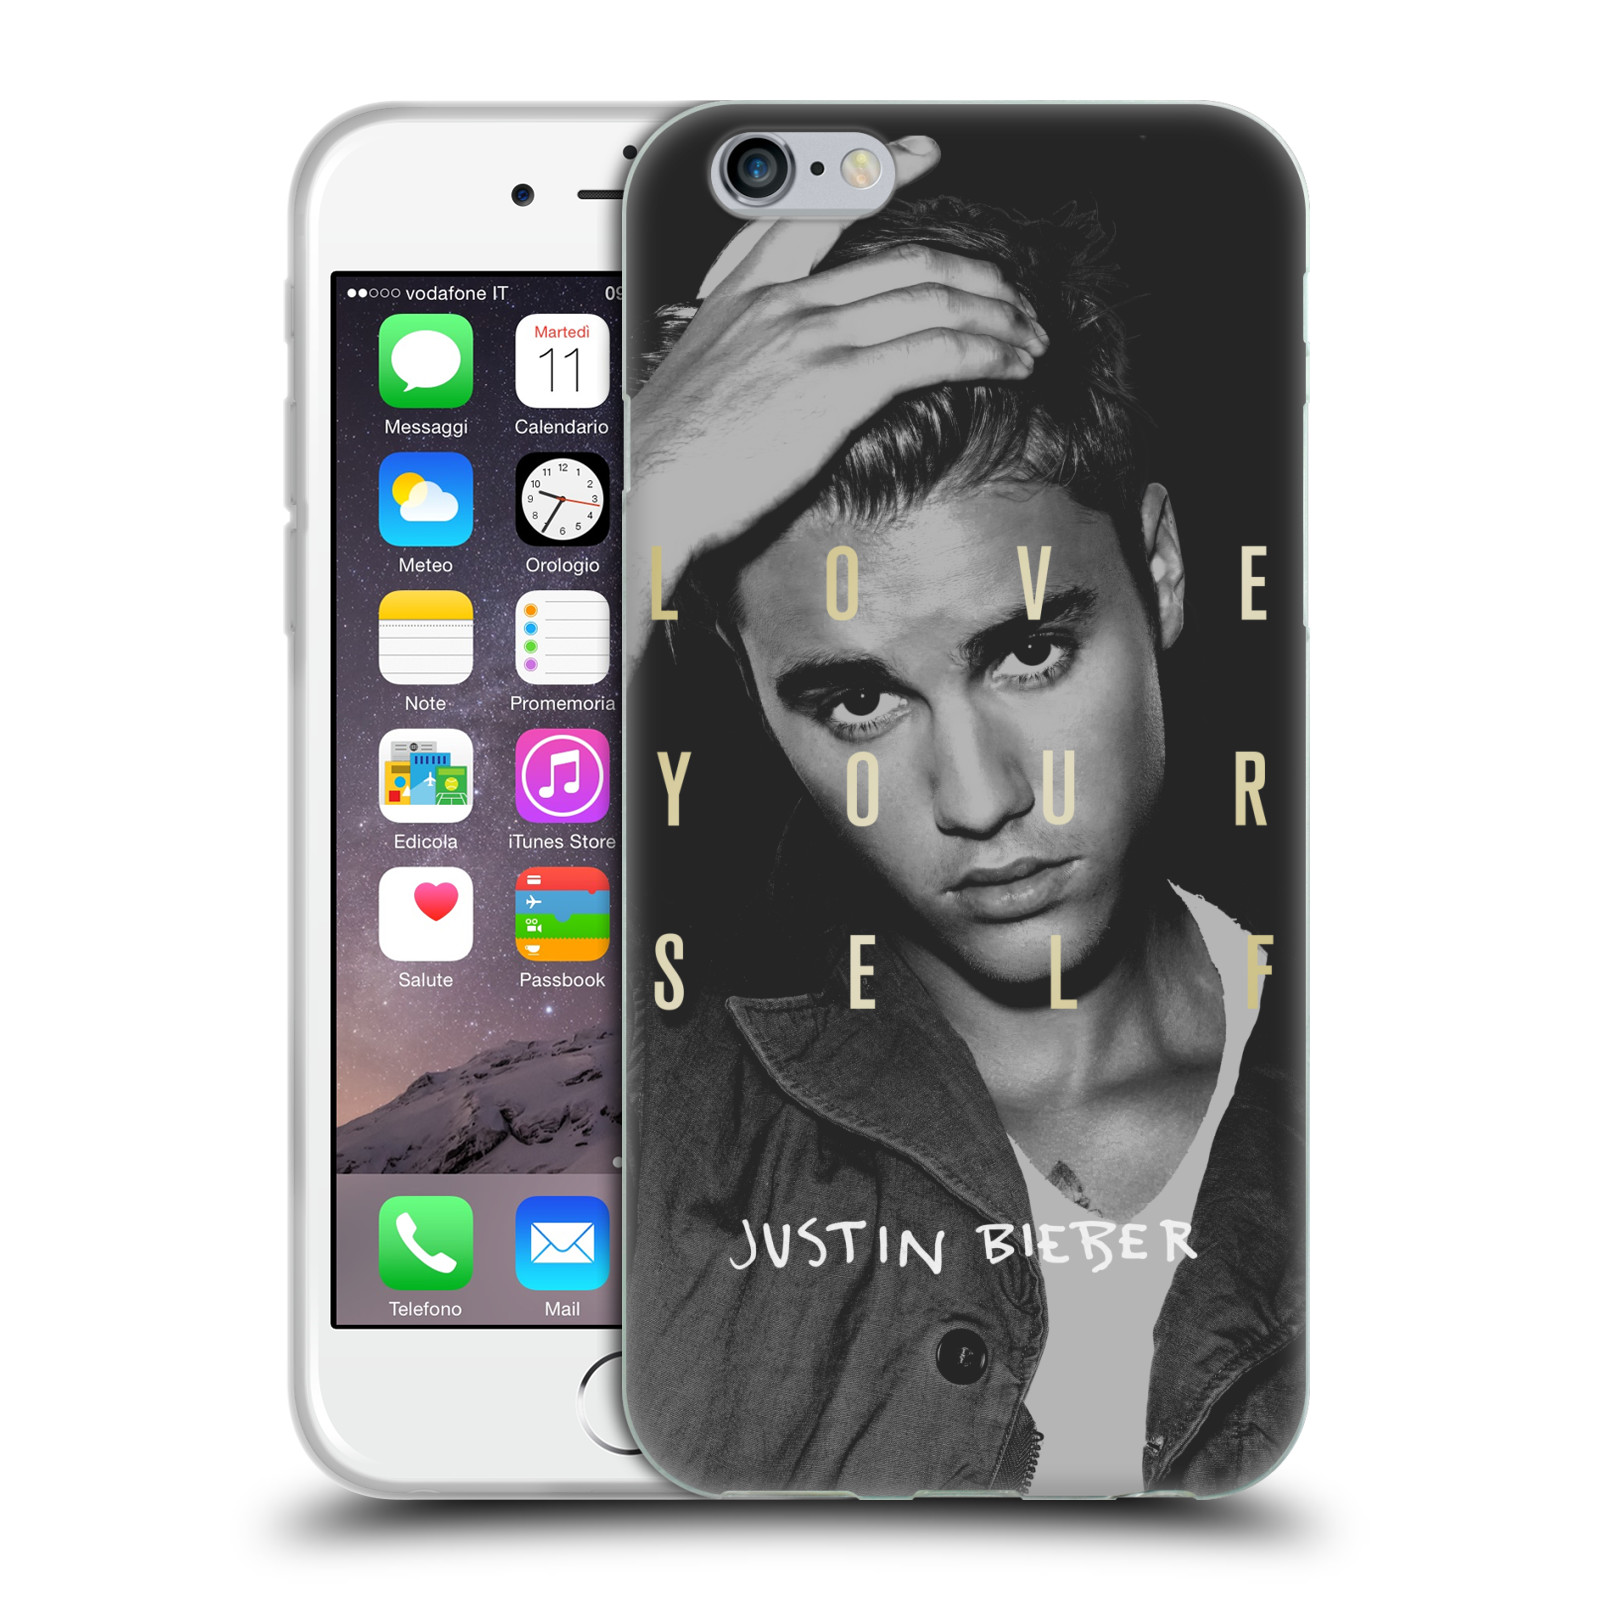 HEAD CASE silikonový obal na mobil Apple Iphone 6 / 6S originální potisk Justin Bieber foto text